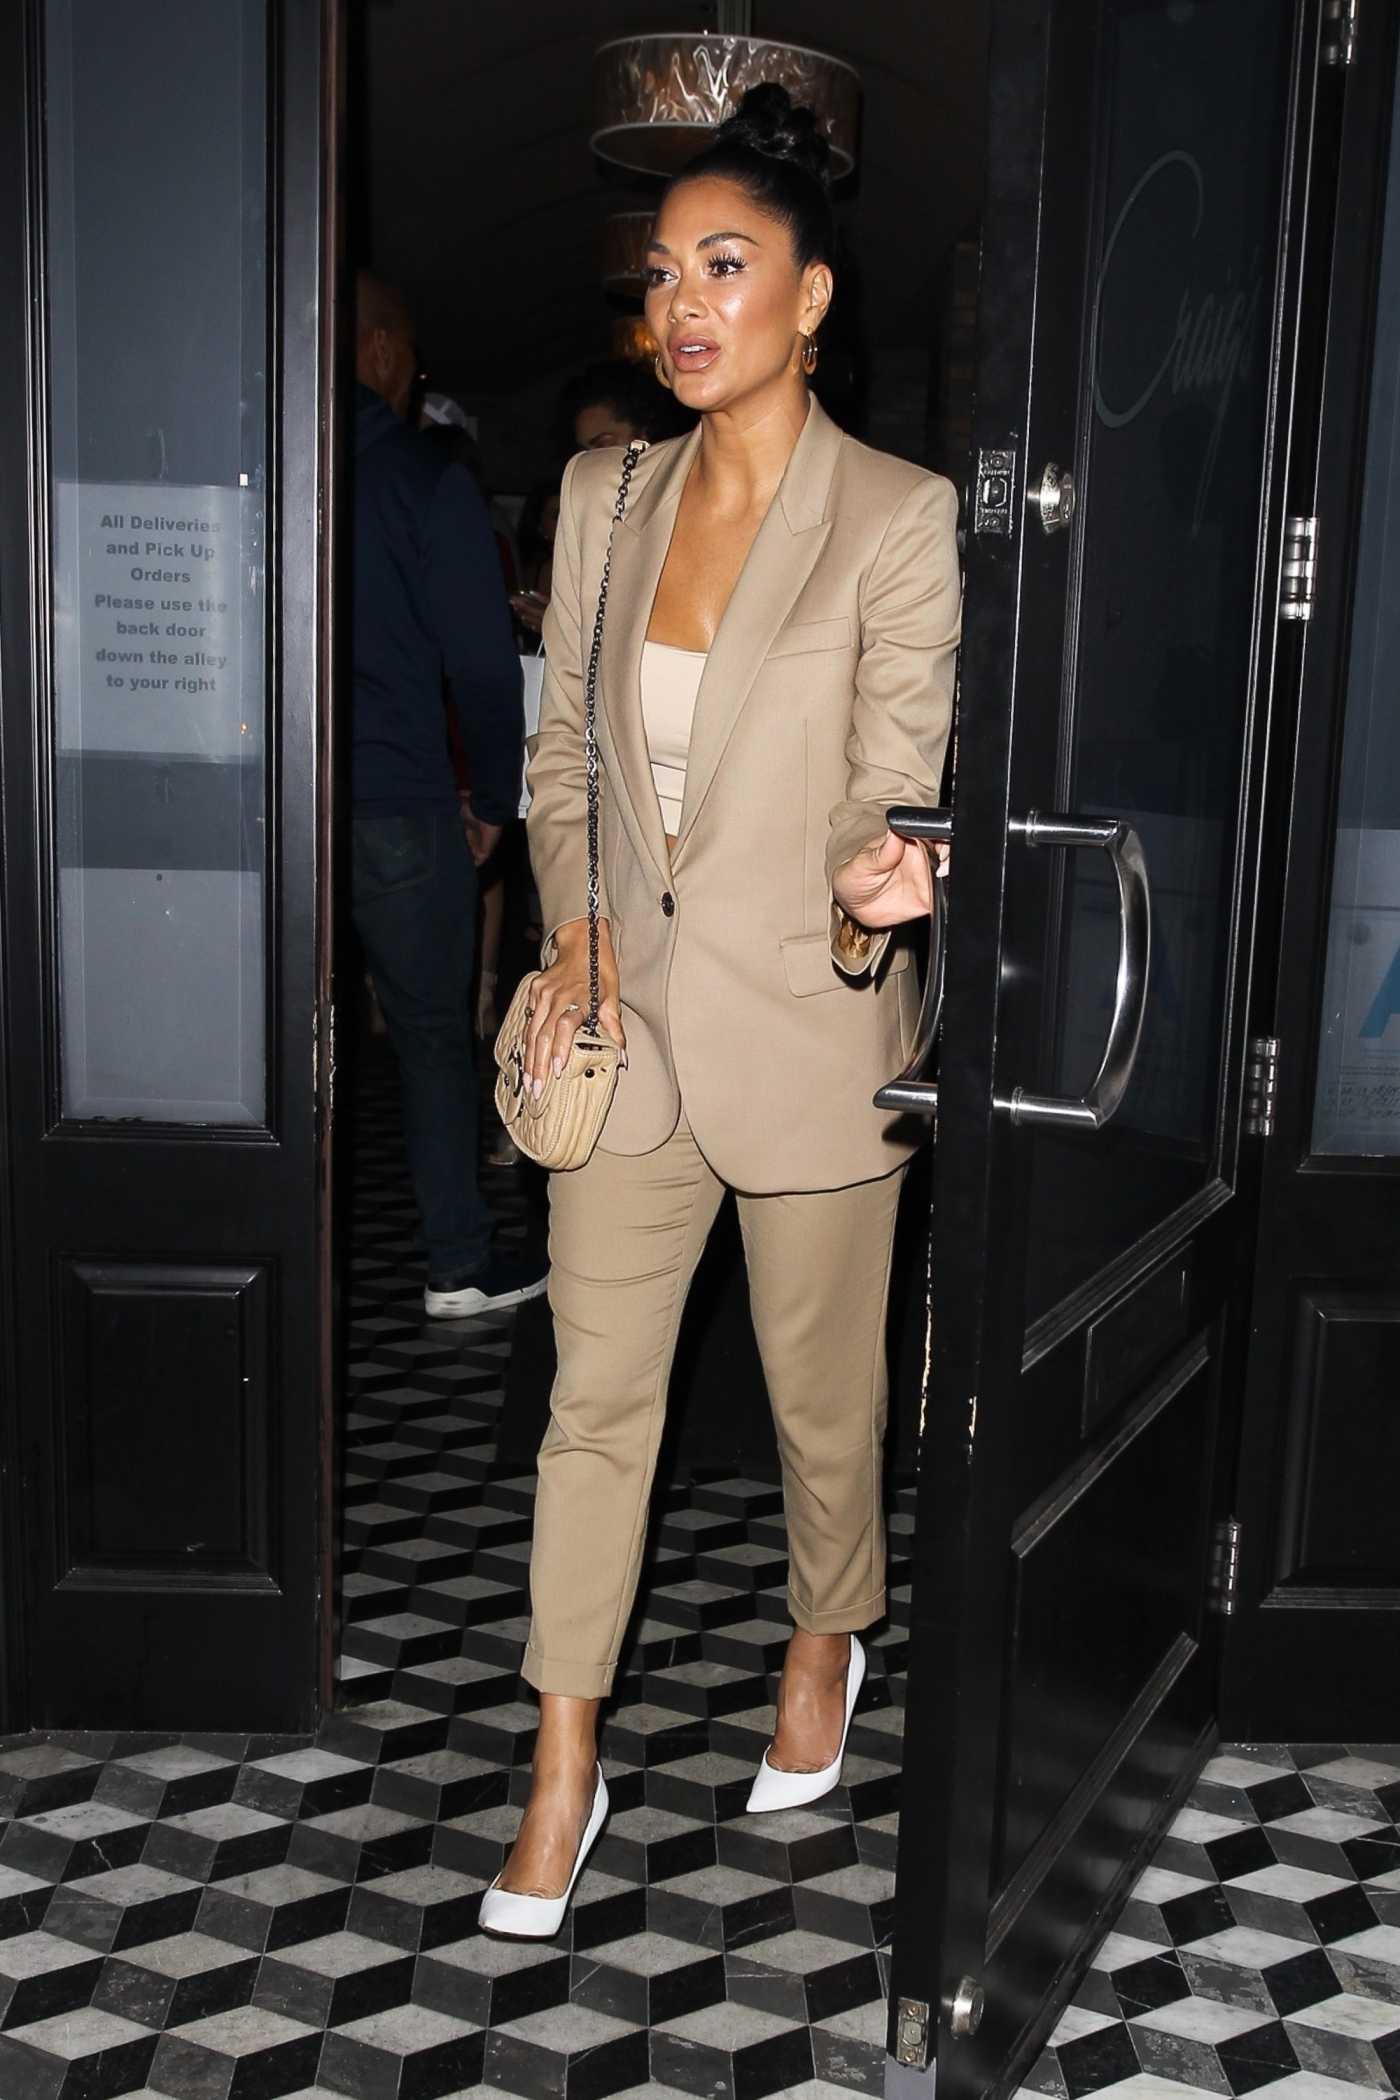 Nicole Scherzinger in a Beige Suit Leaves Craig's Restaurant in West Hollywood 01/24/2020